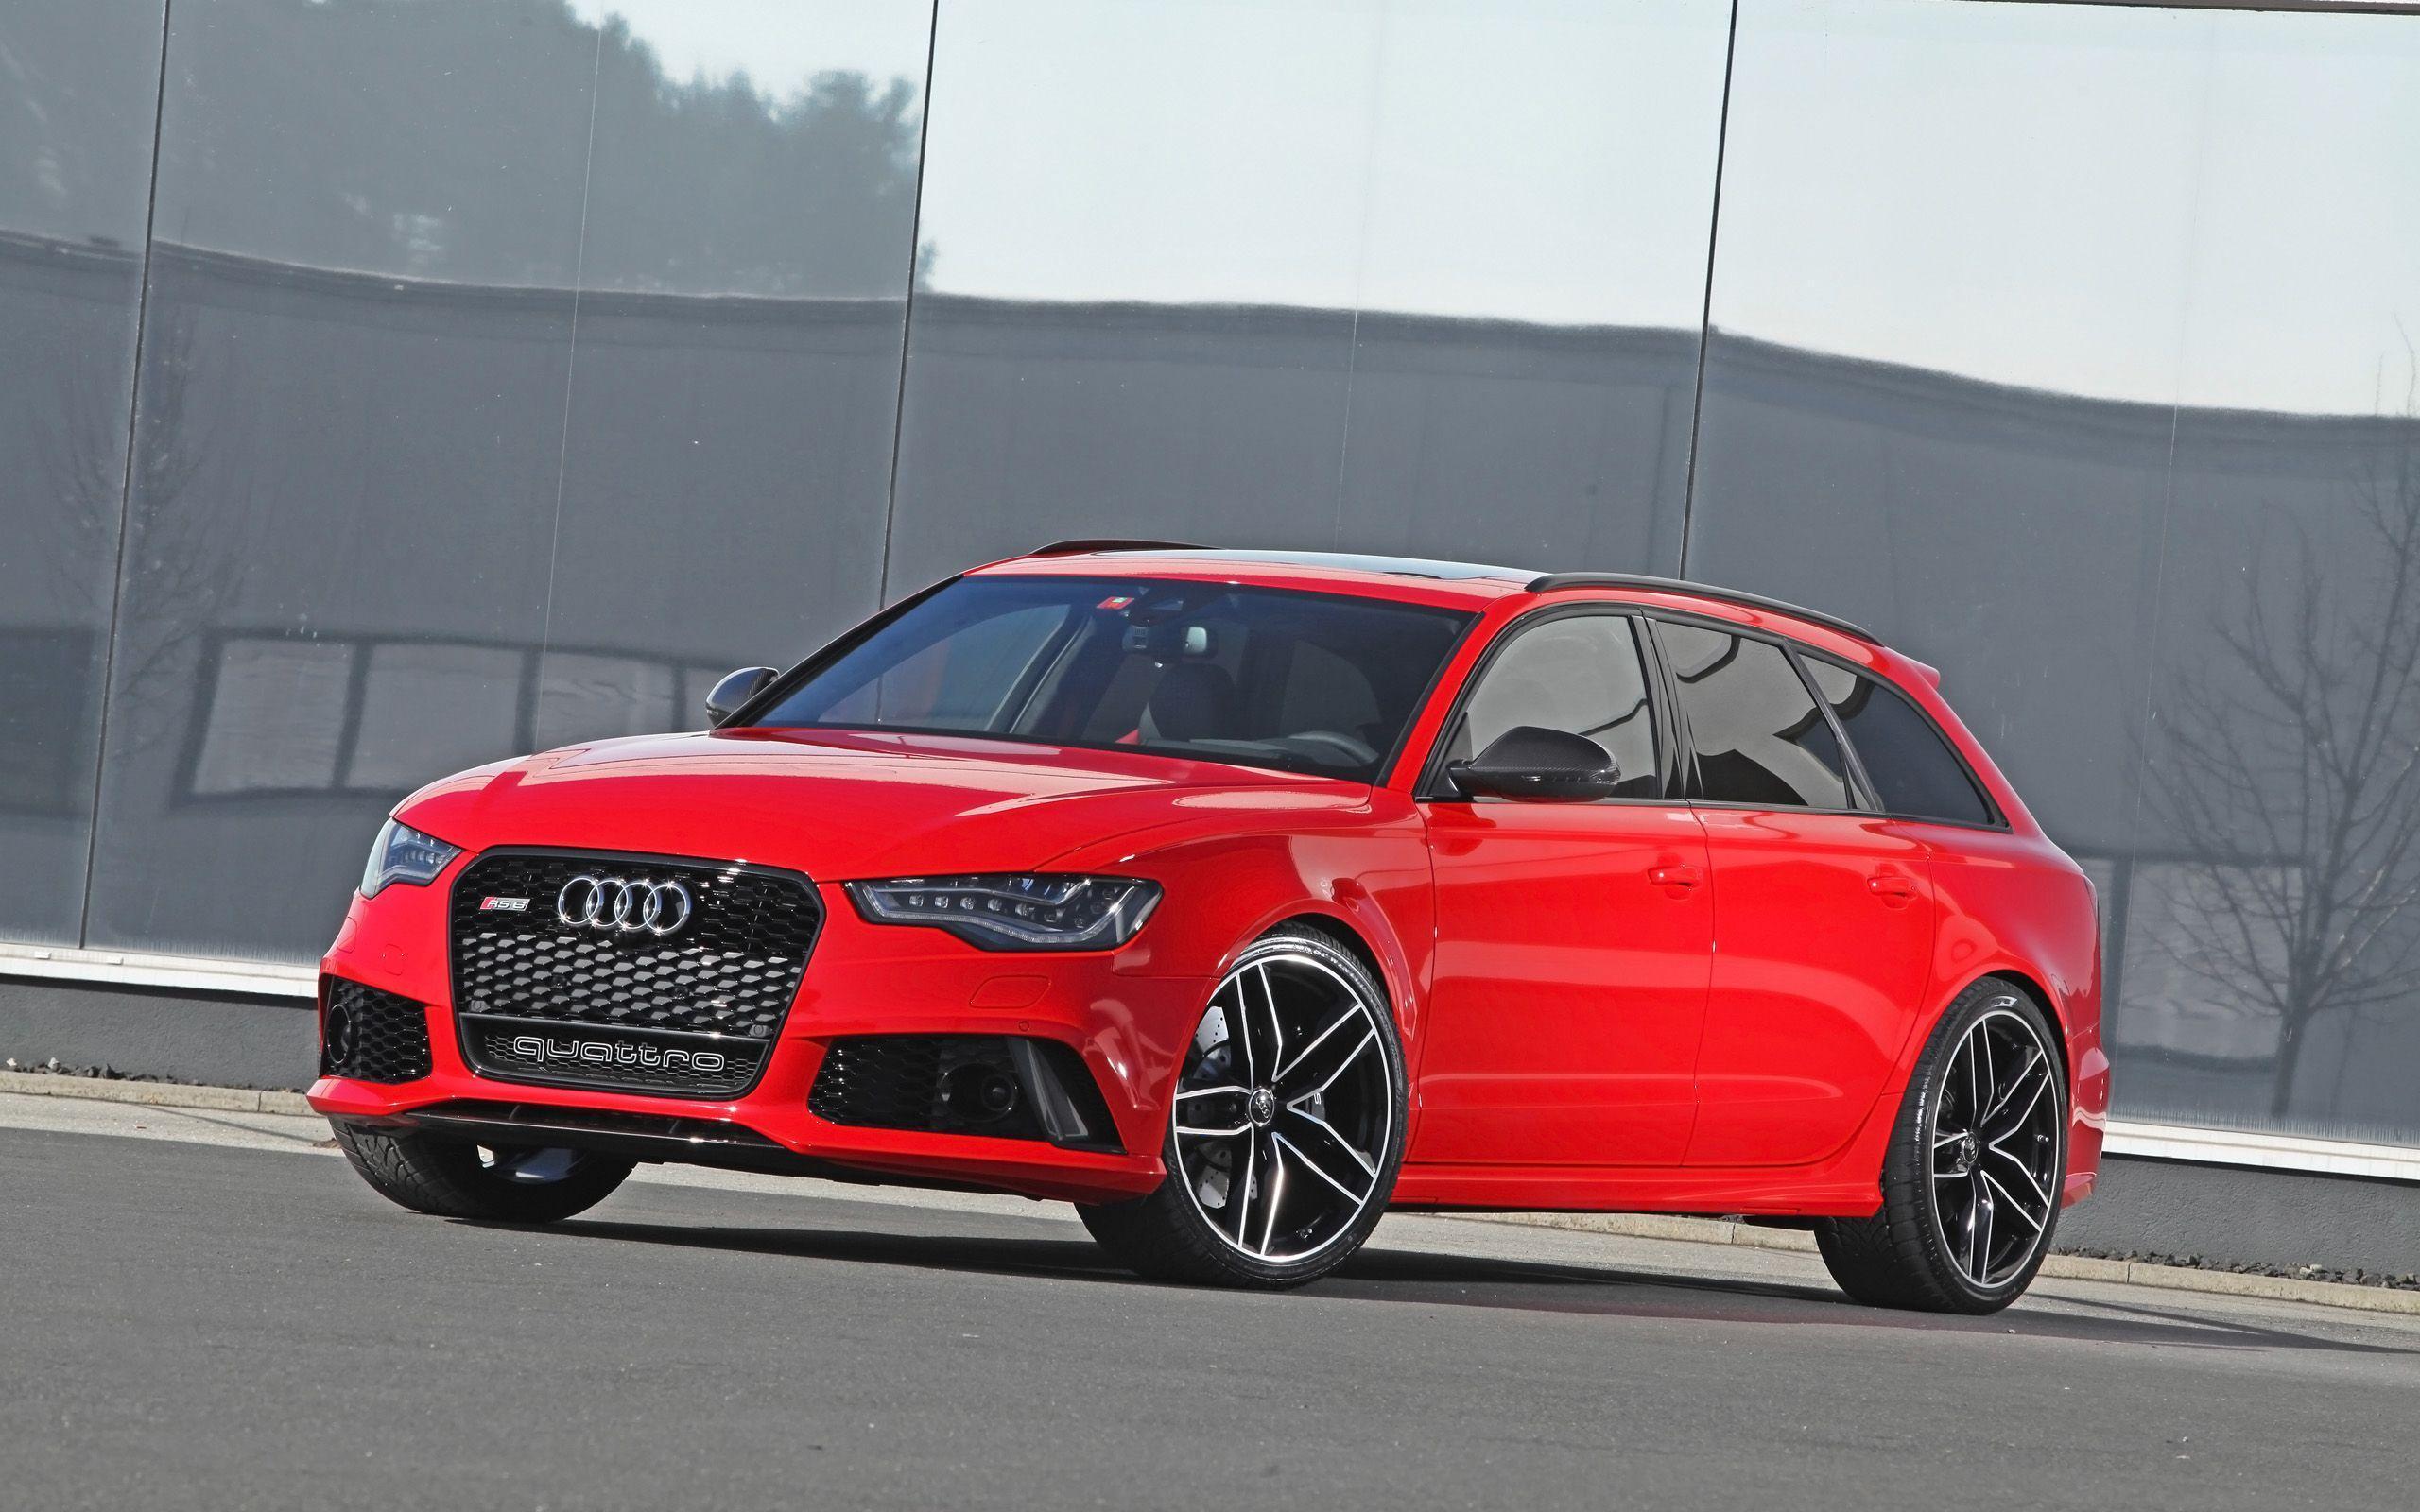 2014 HPerformance Audi RS6 AS Wallpaper | HD Car Wallpapers